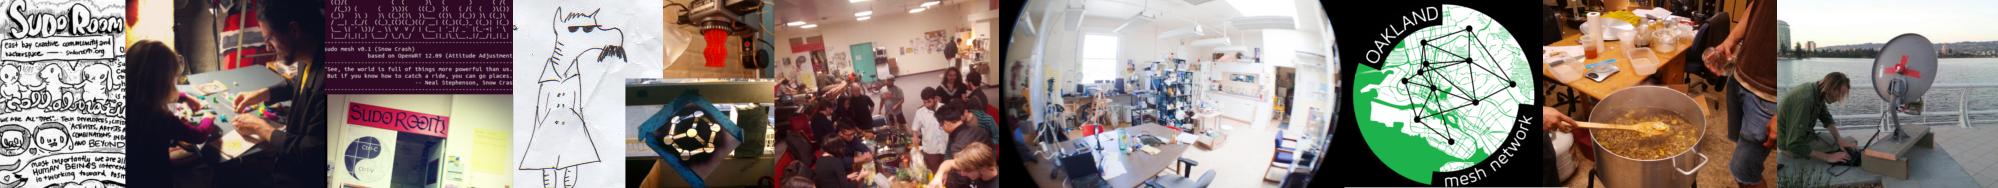 Sudo Room – Creative community and hackerspace